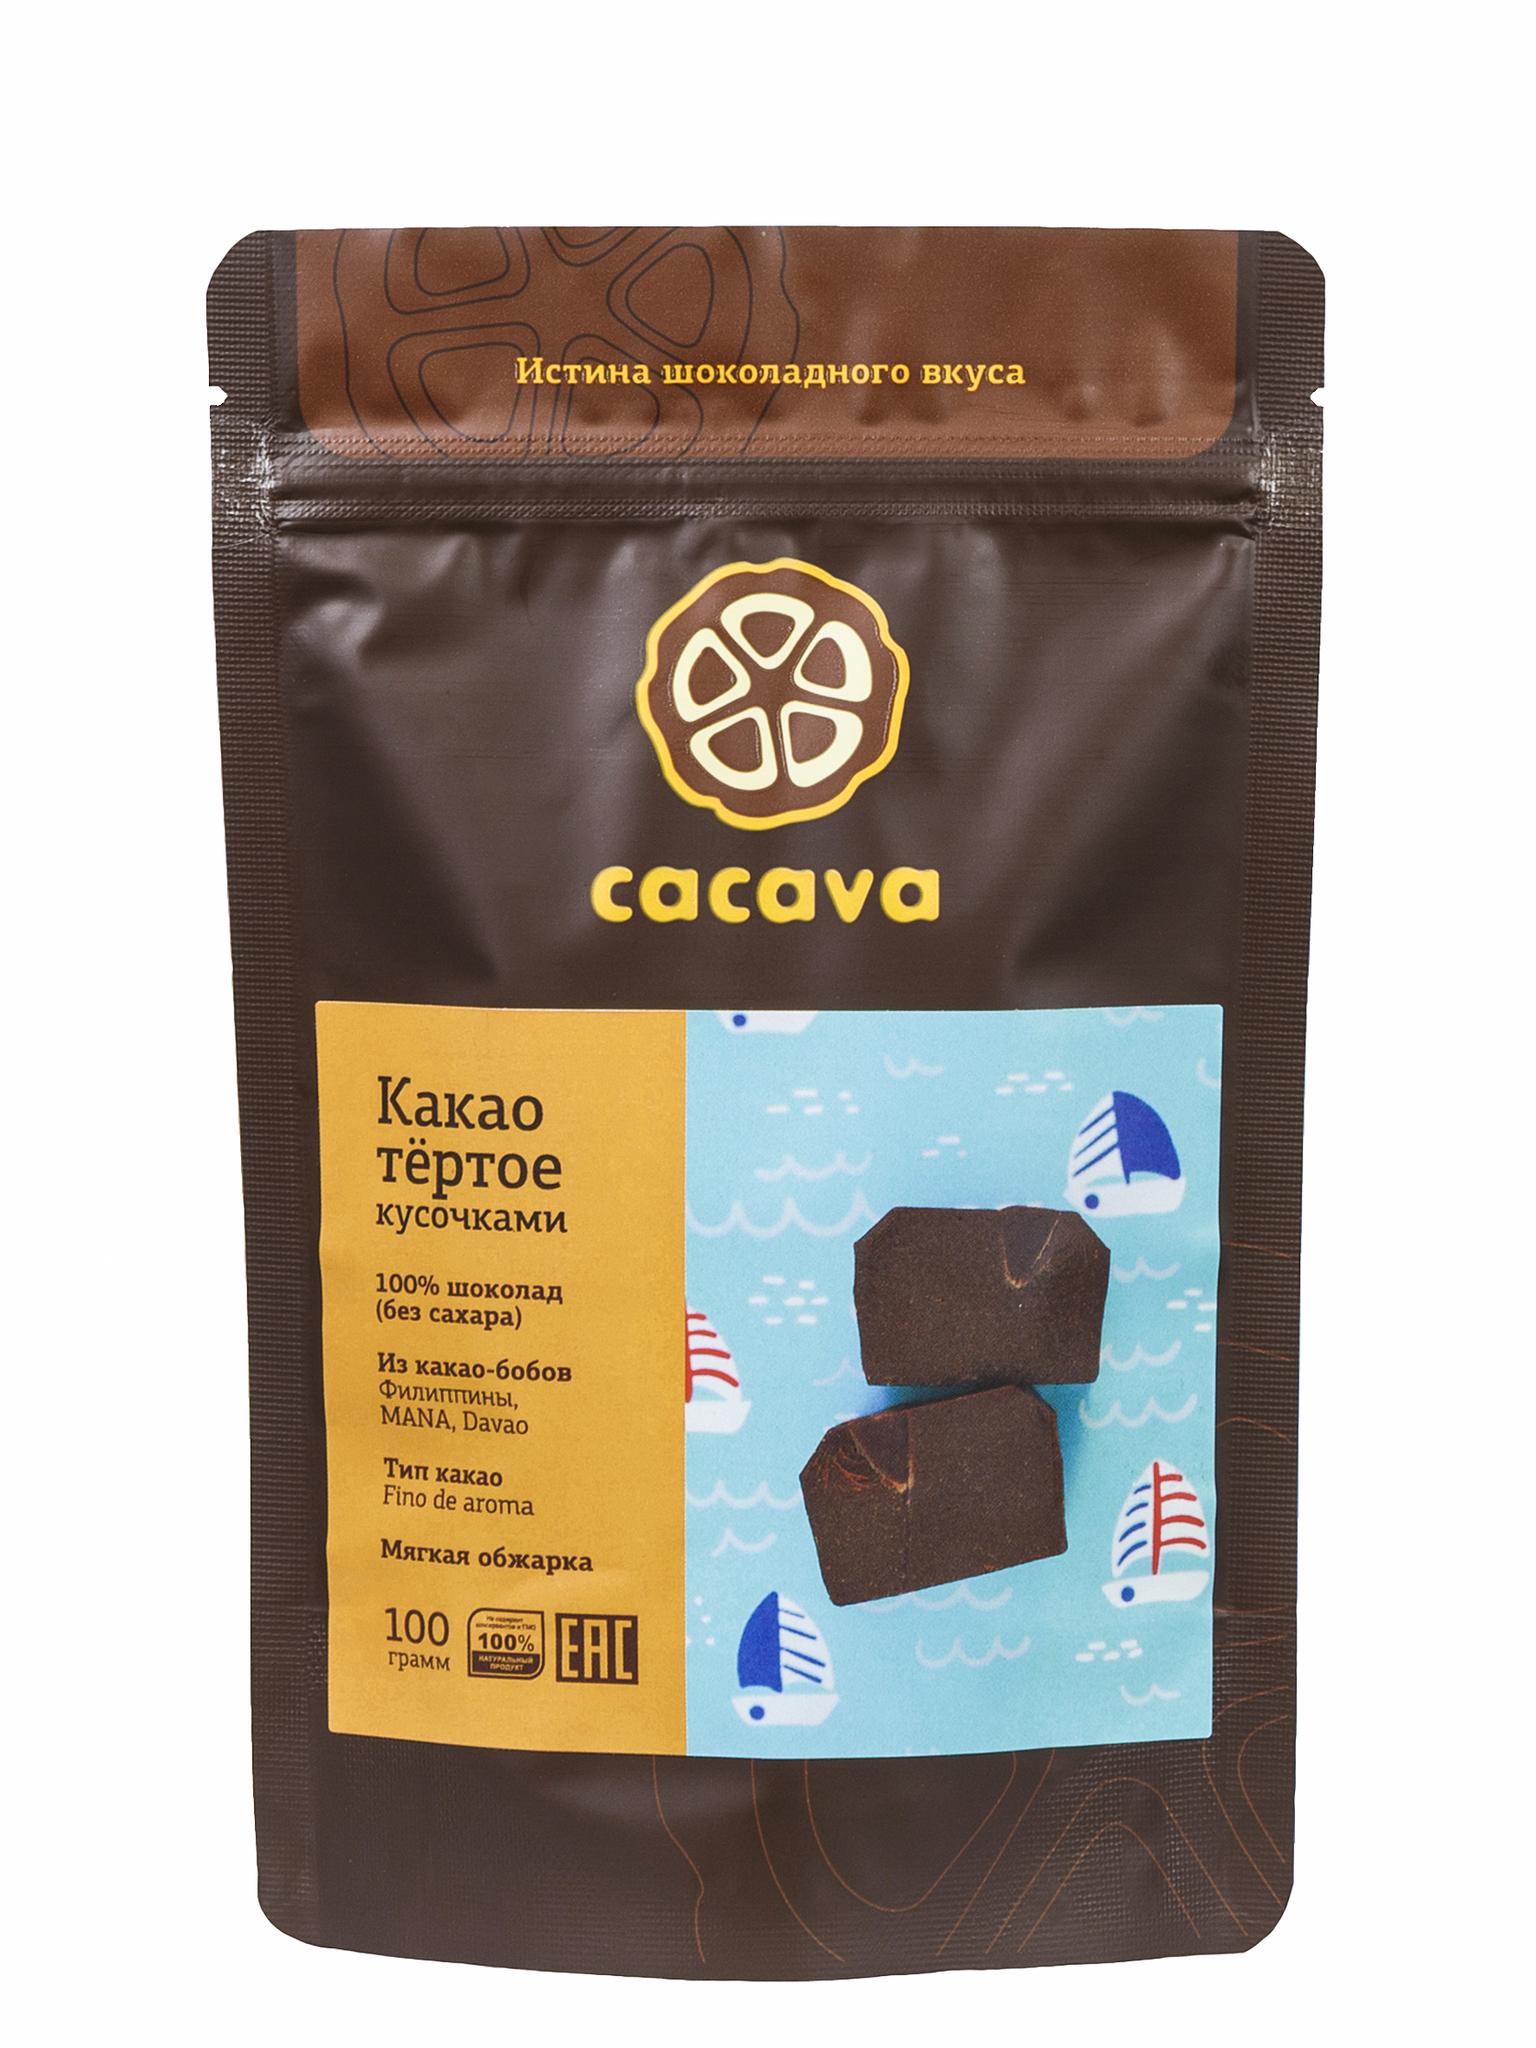 Какао тёртое кусочками (Филиппины, MANA, Davao), упаковка 100 грамм